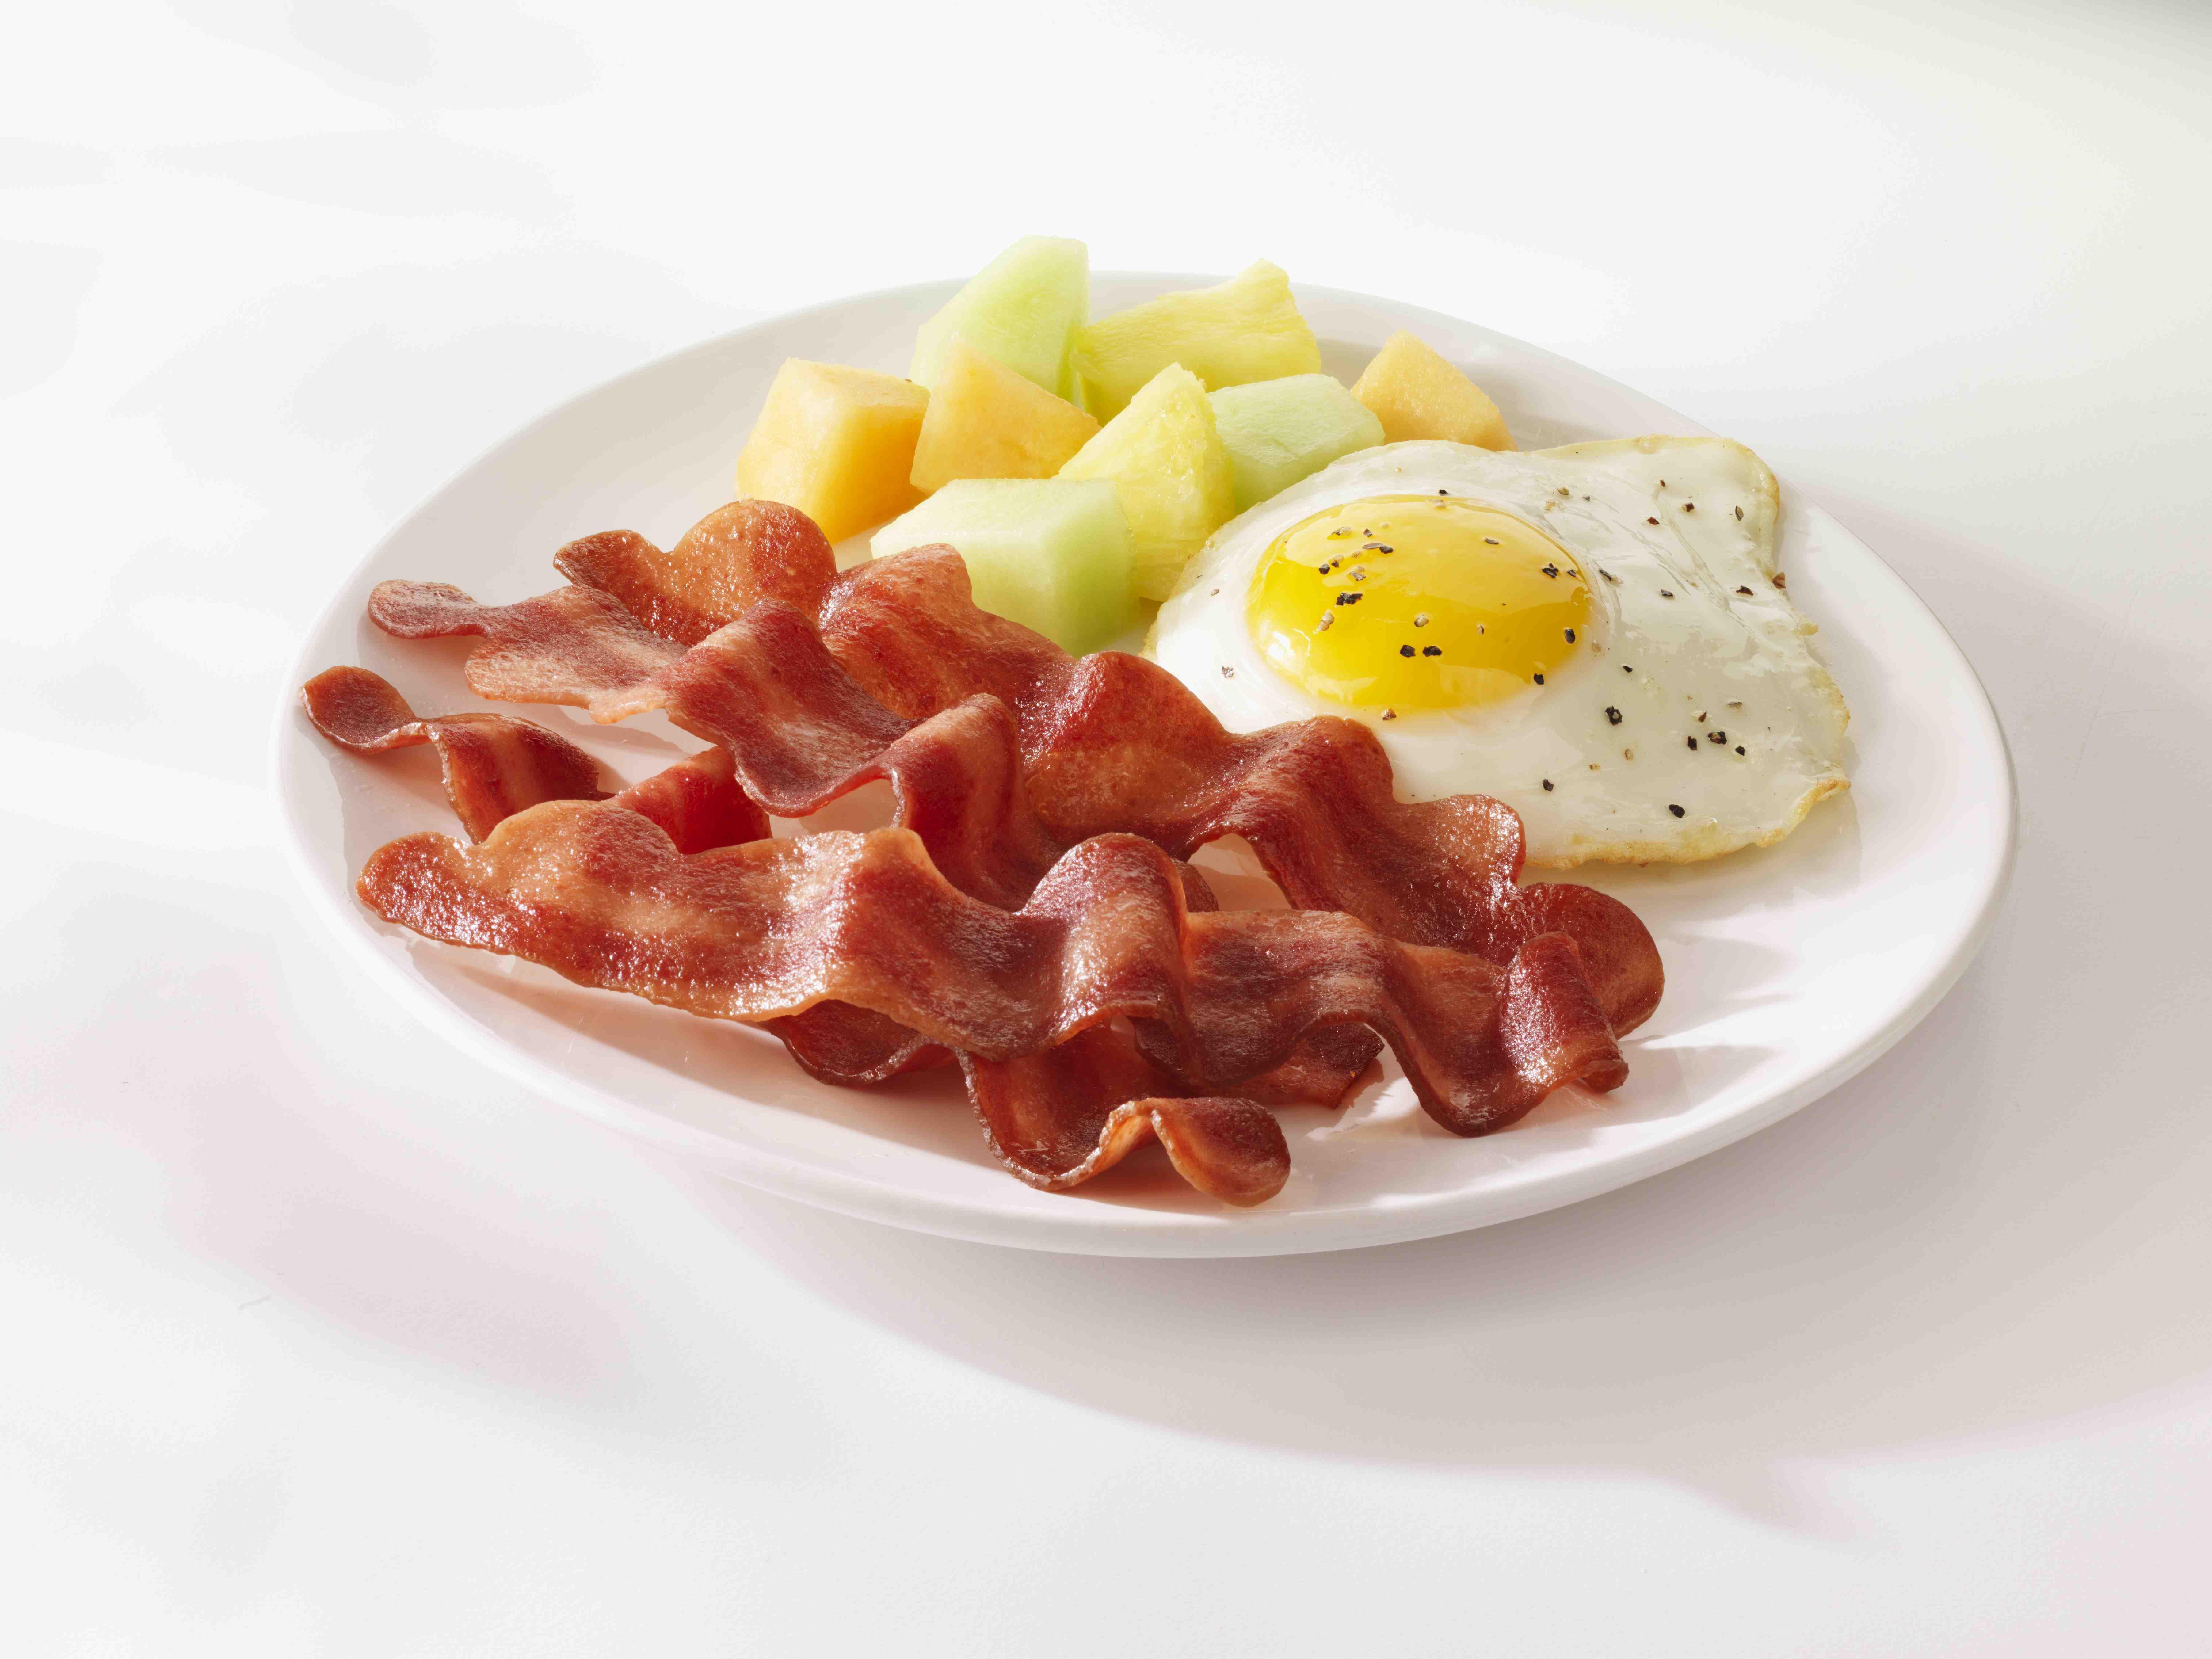 Butterball Turkey Bacon 2/6# Fzn